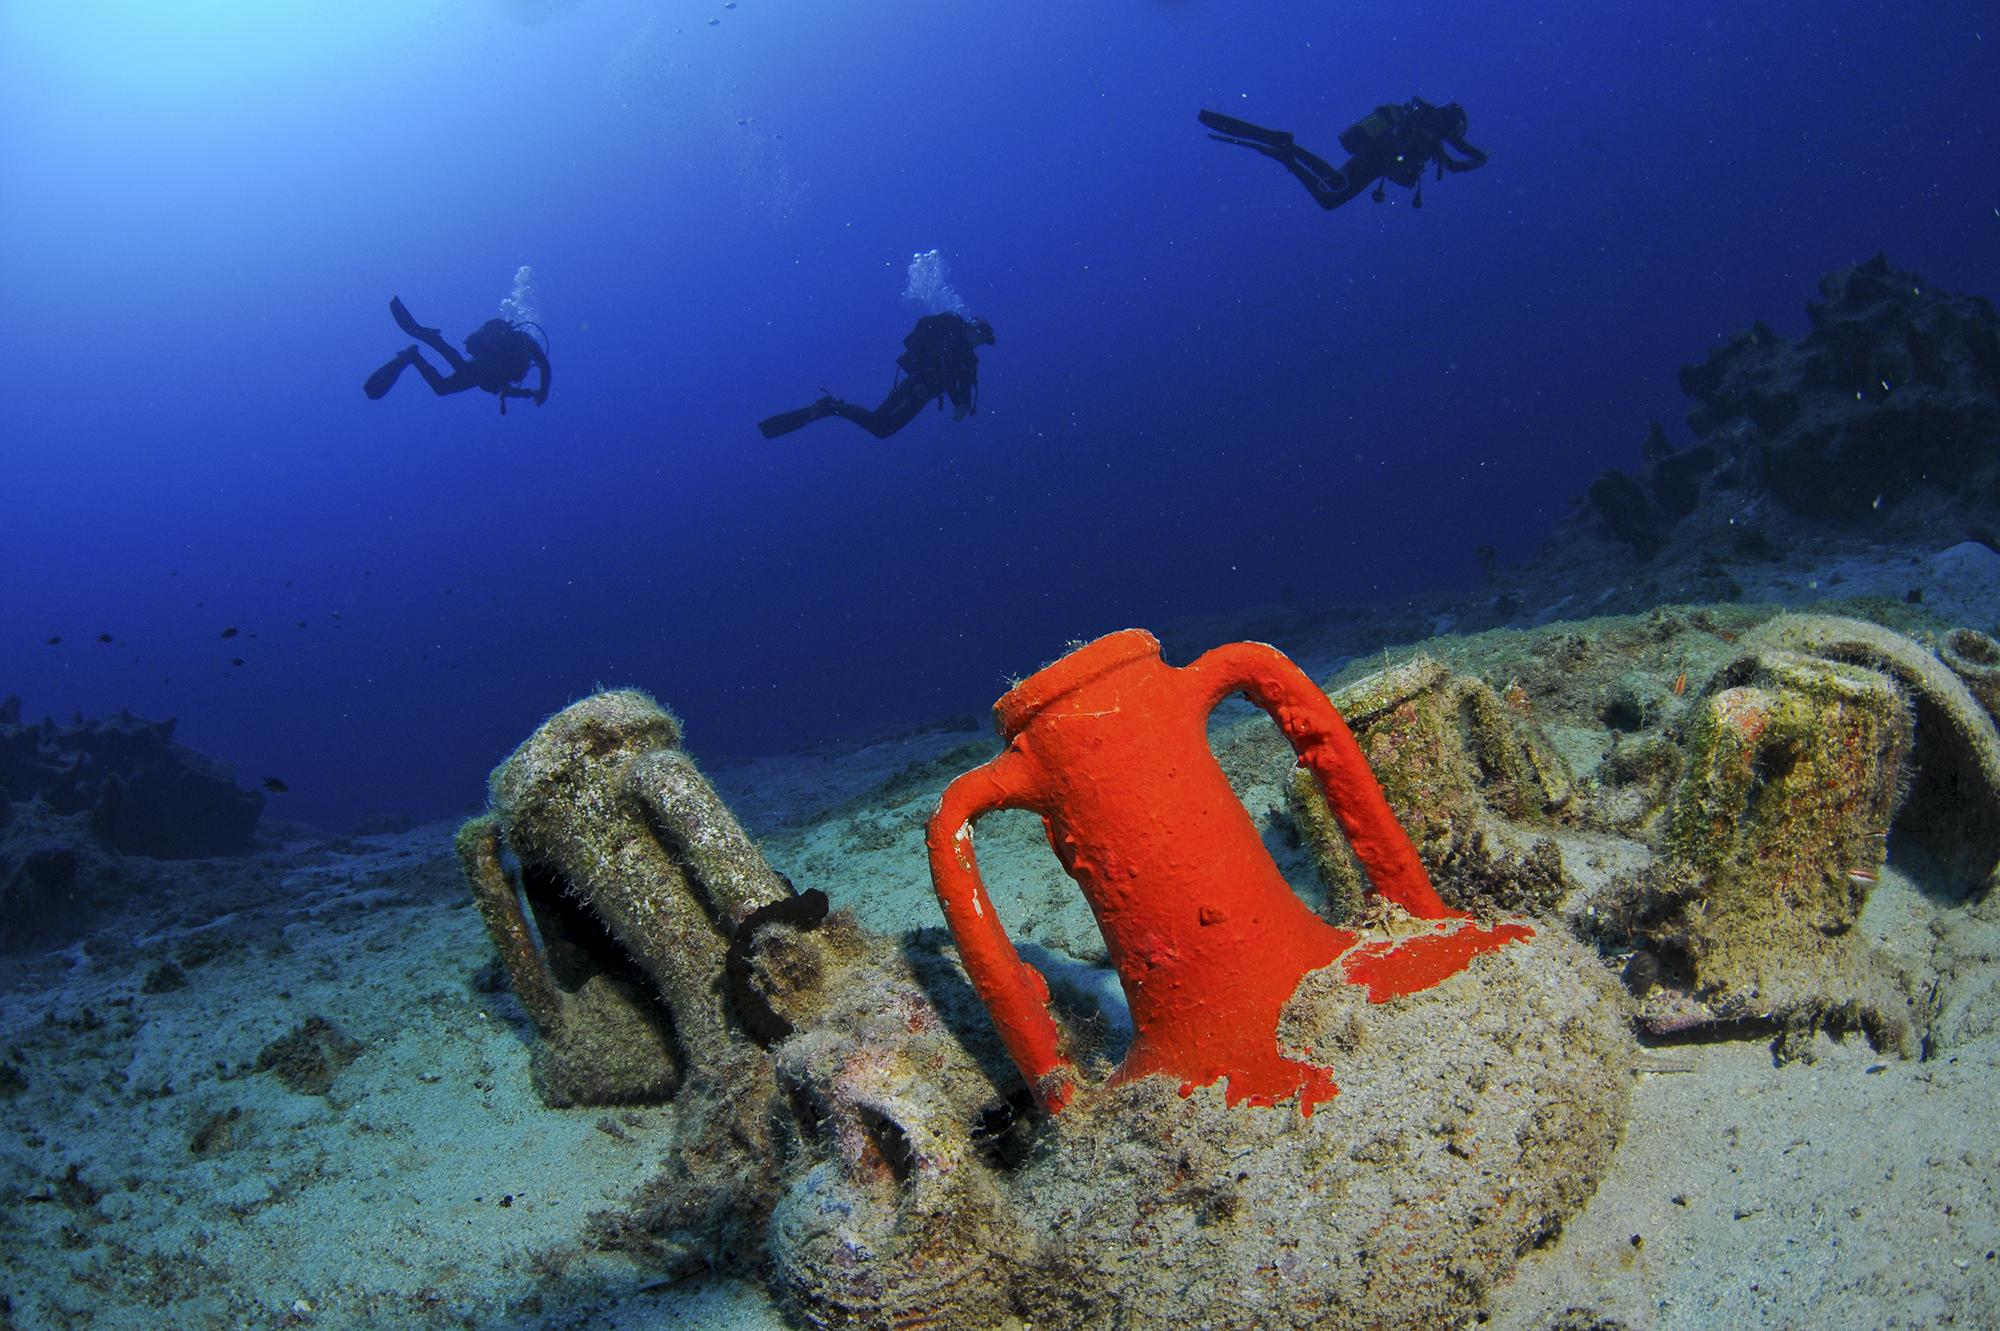 norskk_diving.jpg